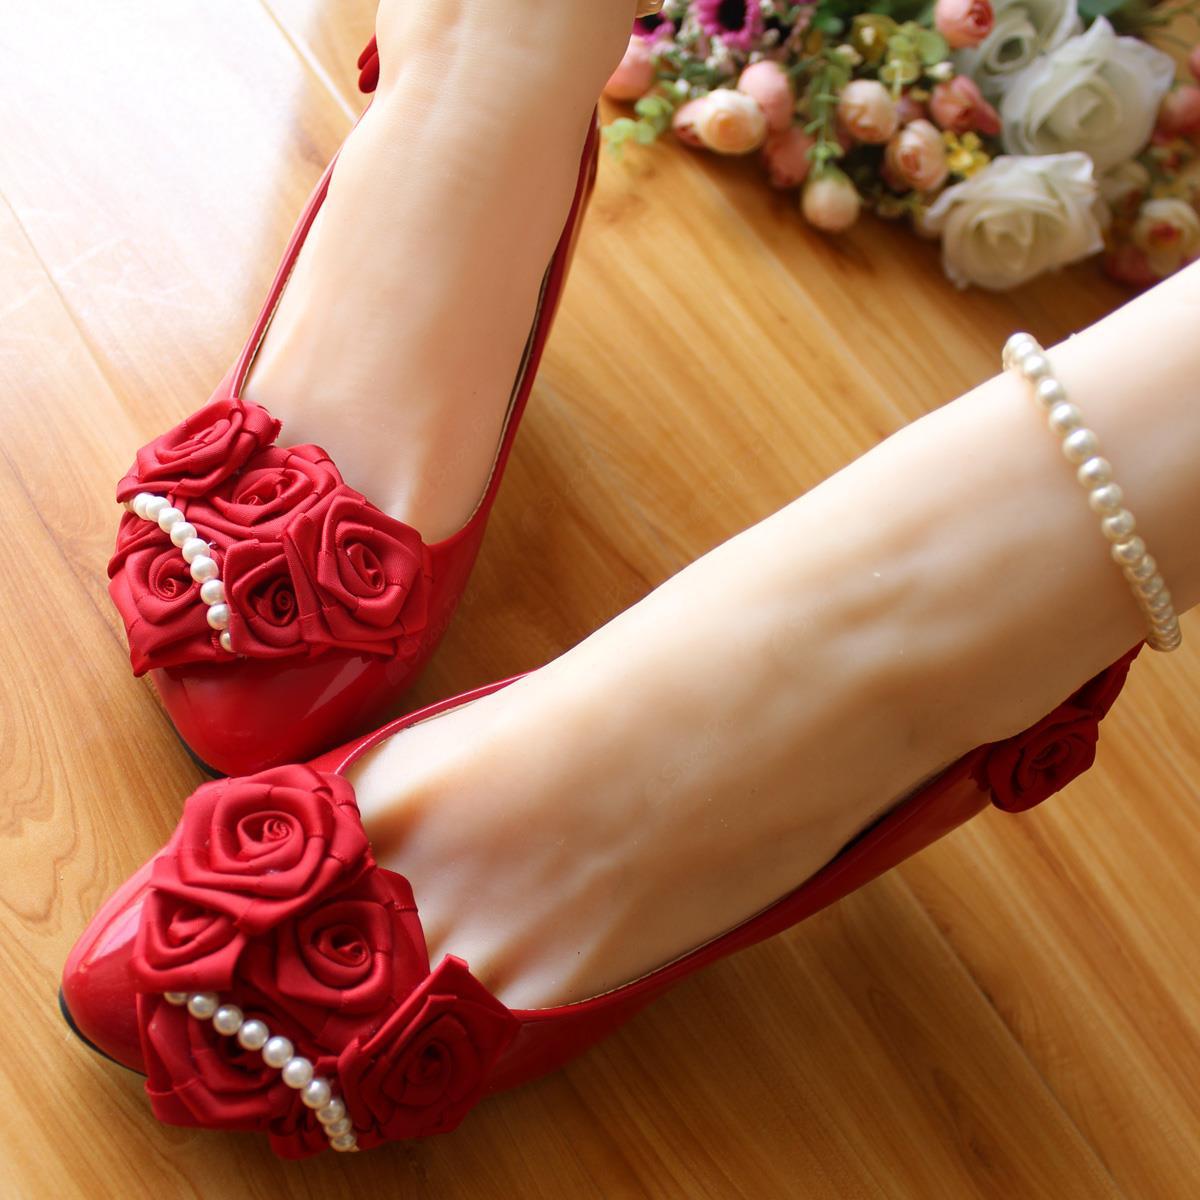 0fbf4ad6bdcf Shoespie Reviews  Which Flat Shoes Do You Prefer -Shoespie Reviews